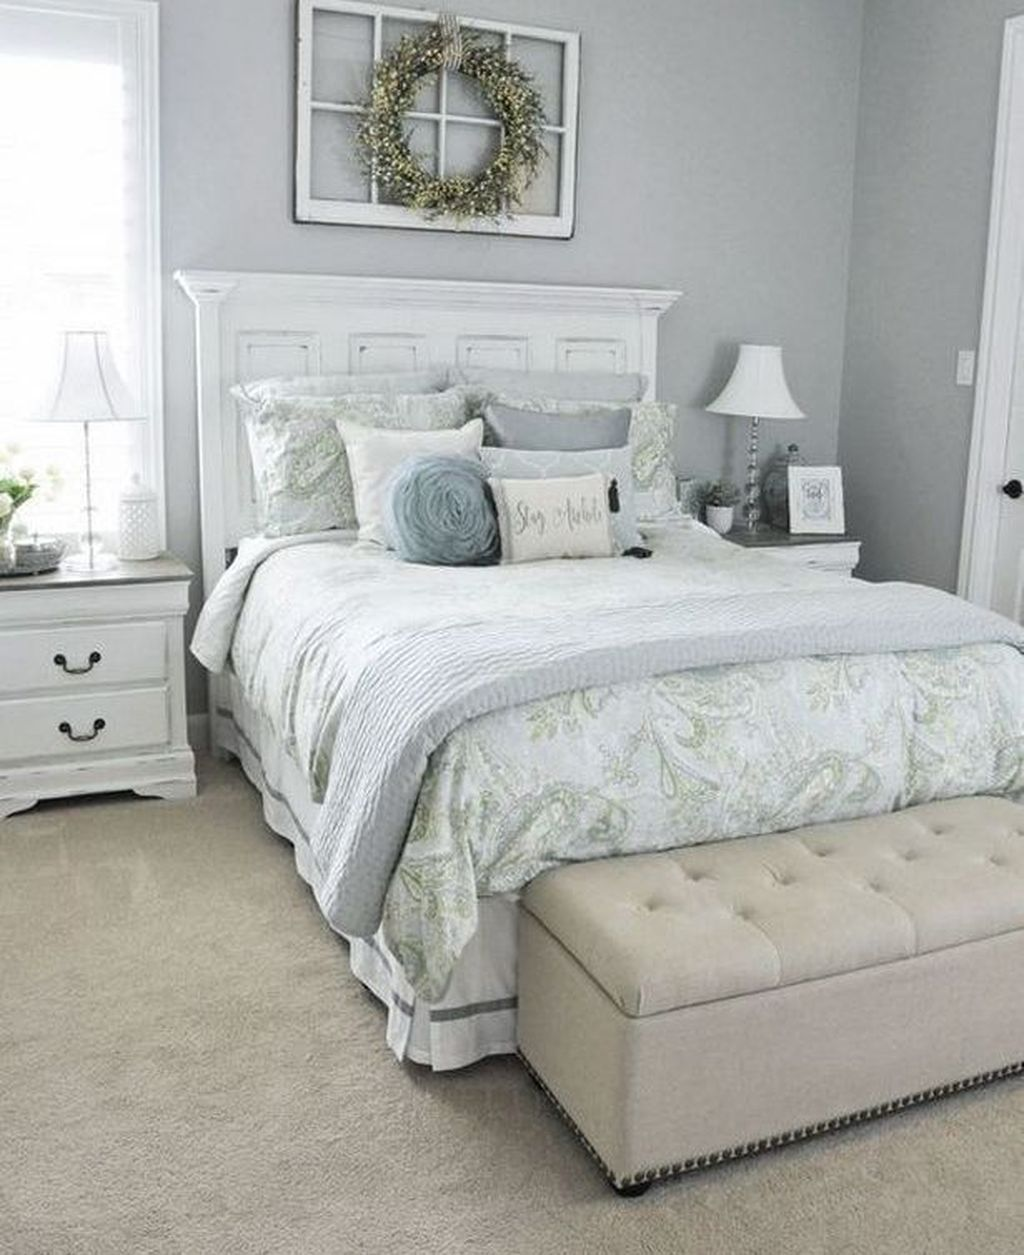 Tiny Master Bedroom Decorating Ideas Pic 012: 48 Popular Small Master Bedroom Makeover Ideas